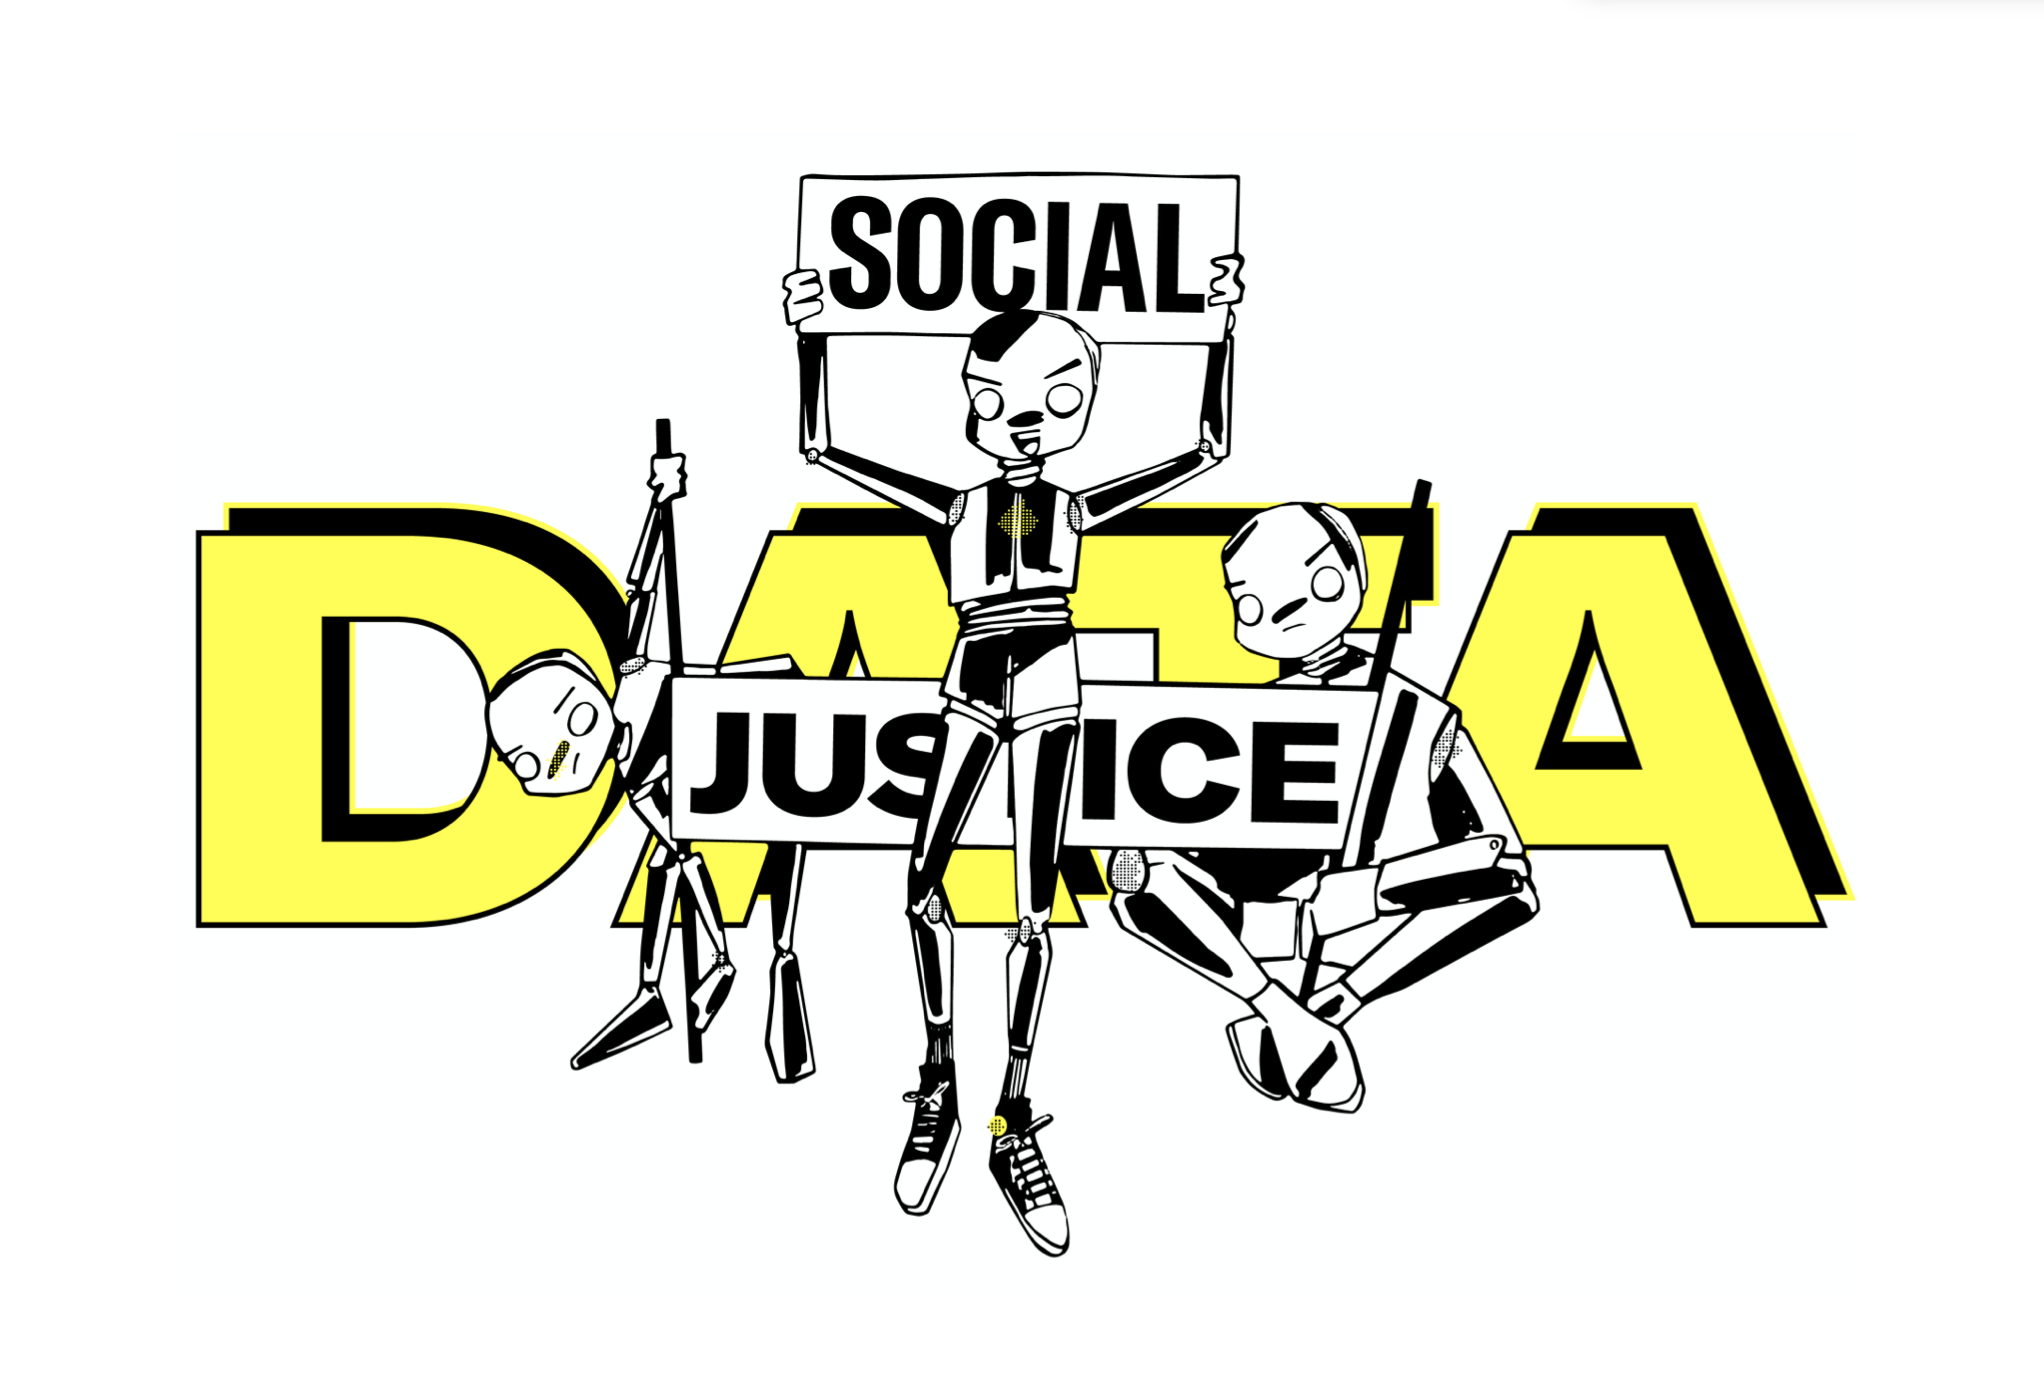 Guidebook Data Literacy Tools - DJL